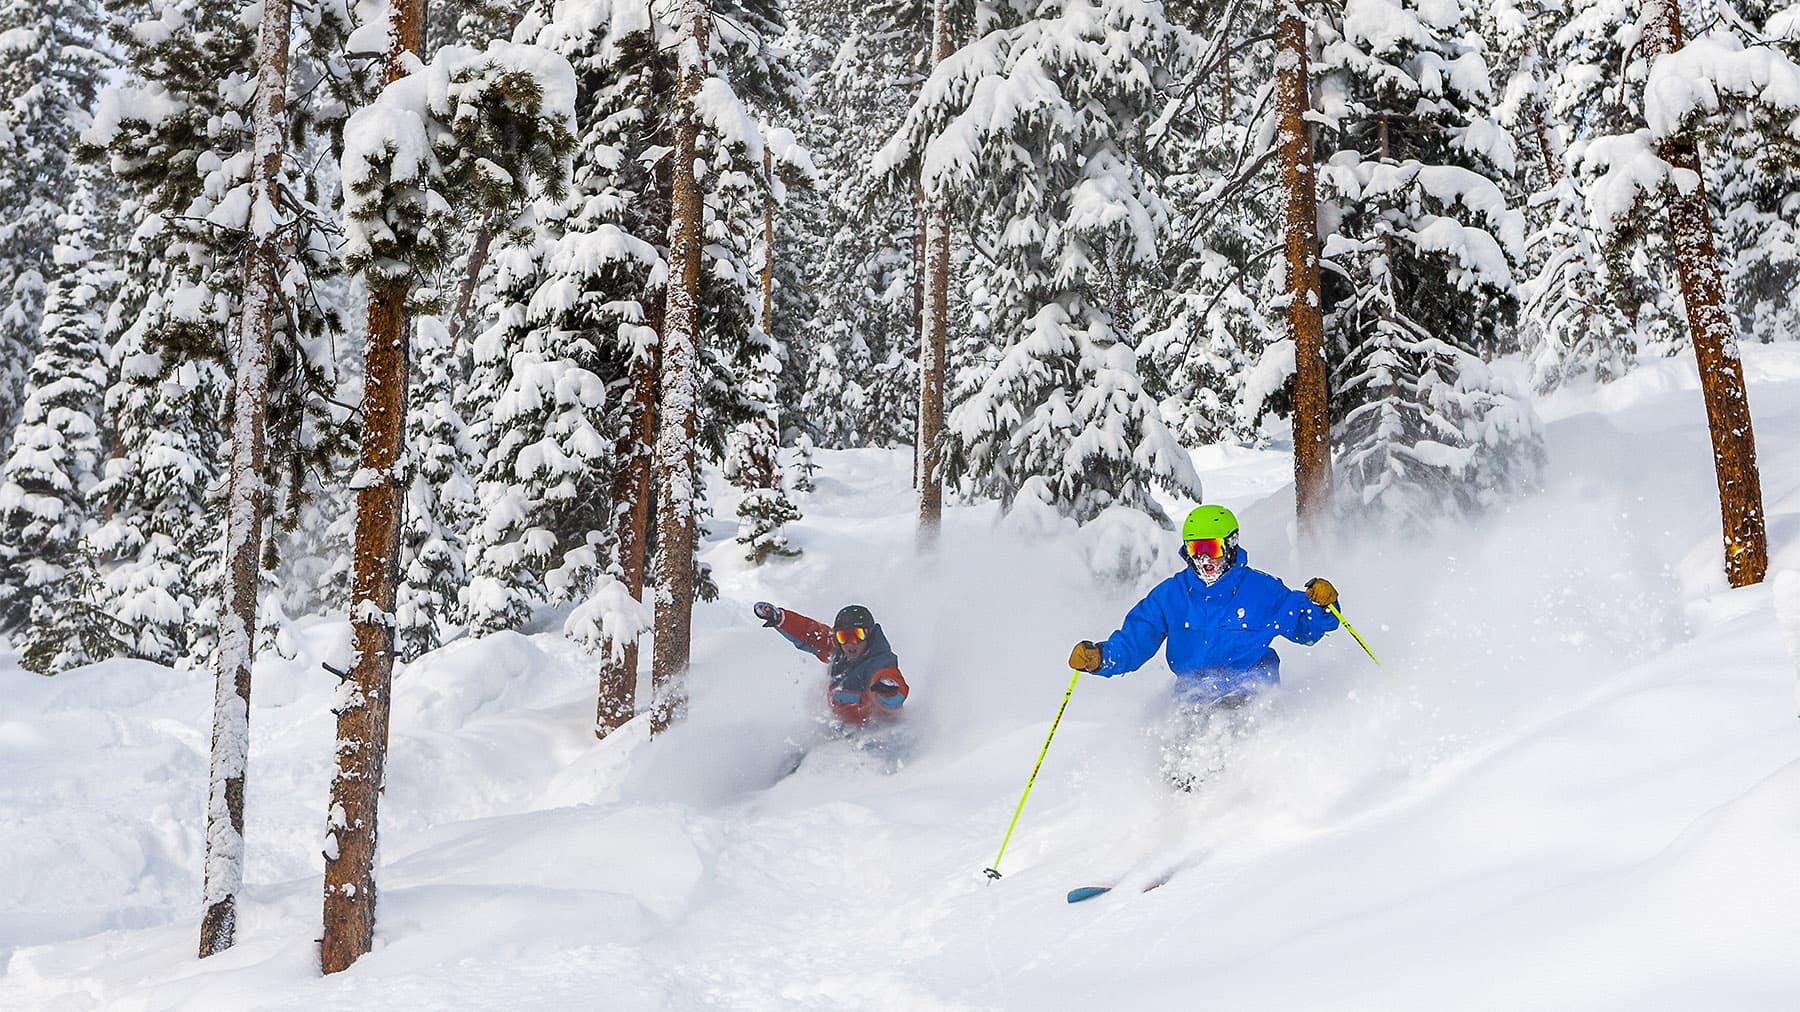 winter park resort - official ski resort website